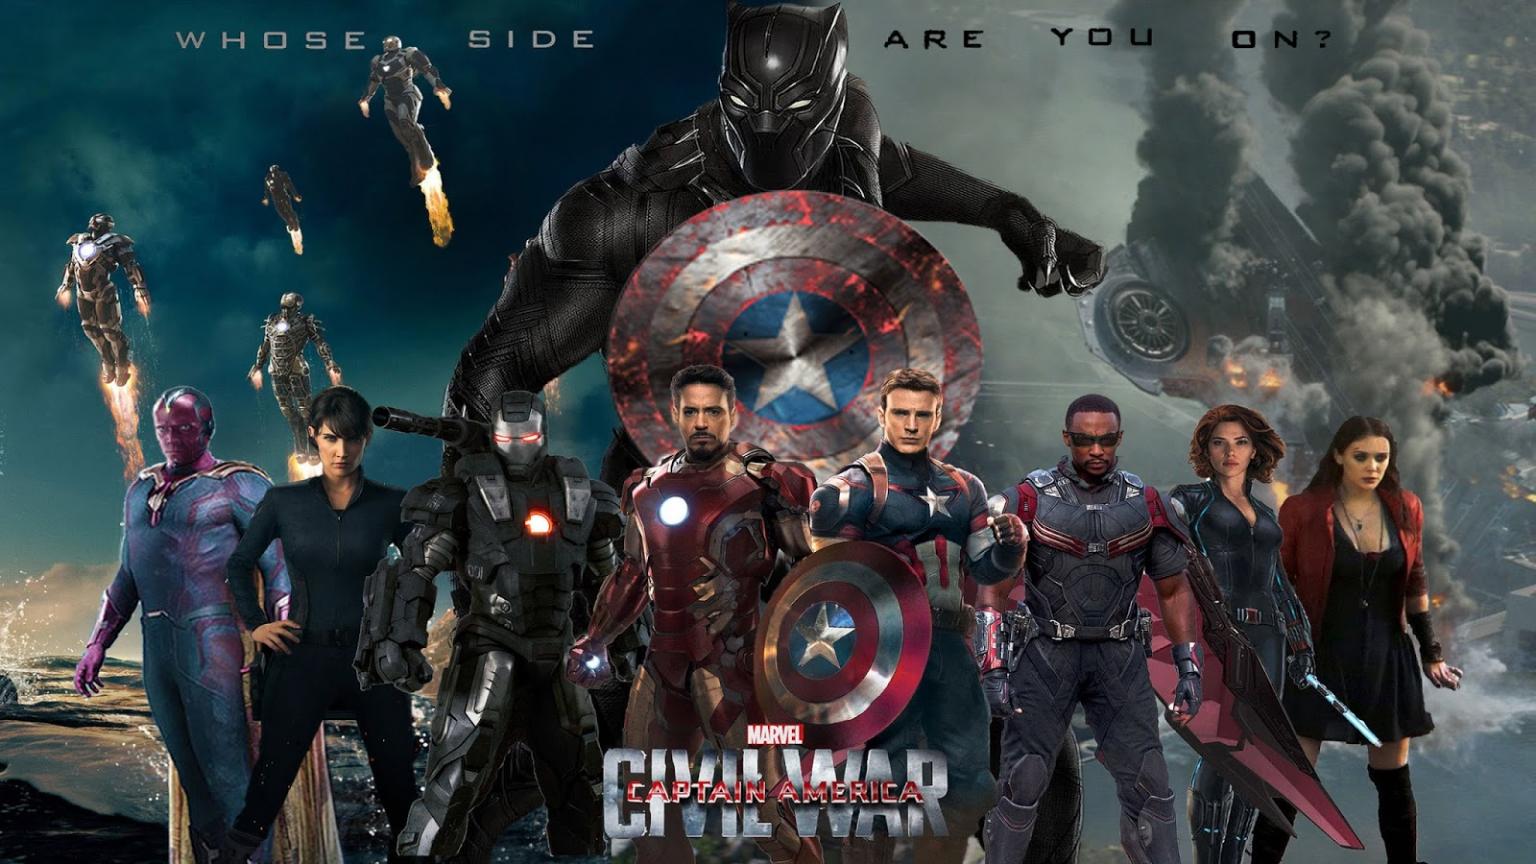 Free Download America Guerra Civil Em Hd 1080p Download Captain